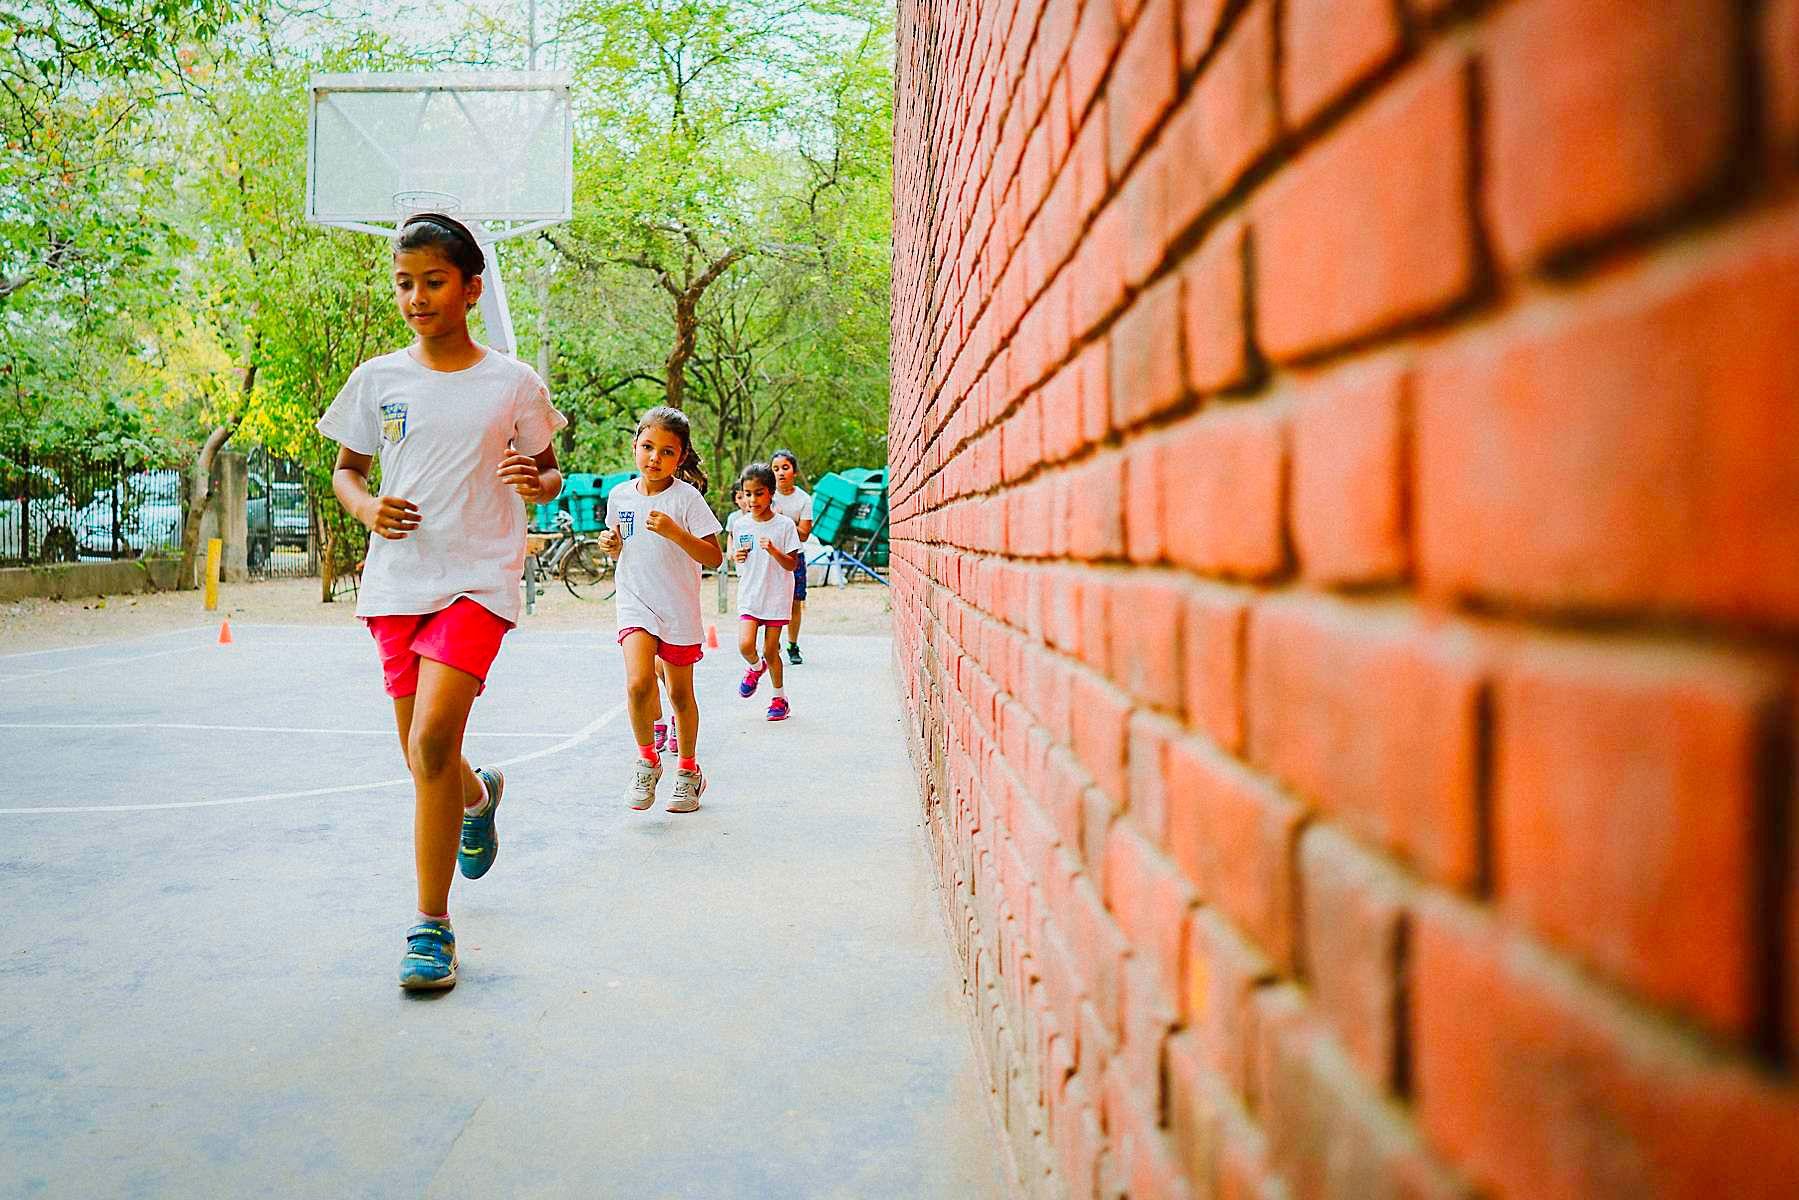 The Art of Sport- Delhi- startup-empowering girls though sports